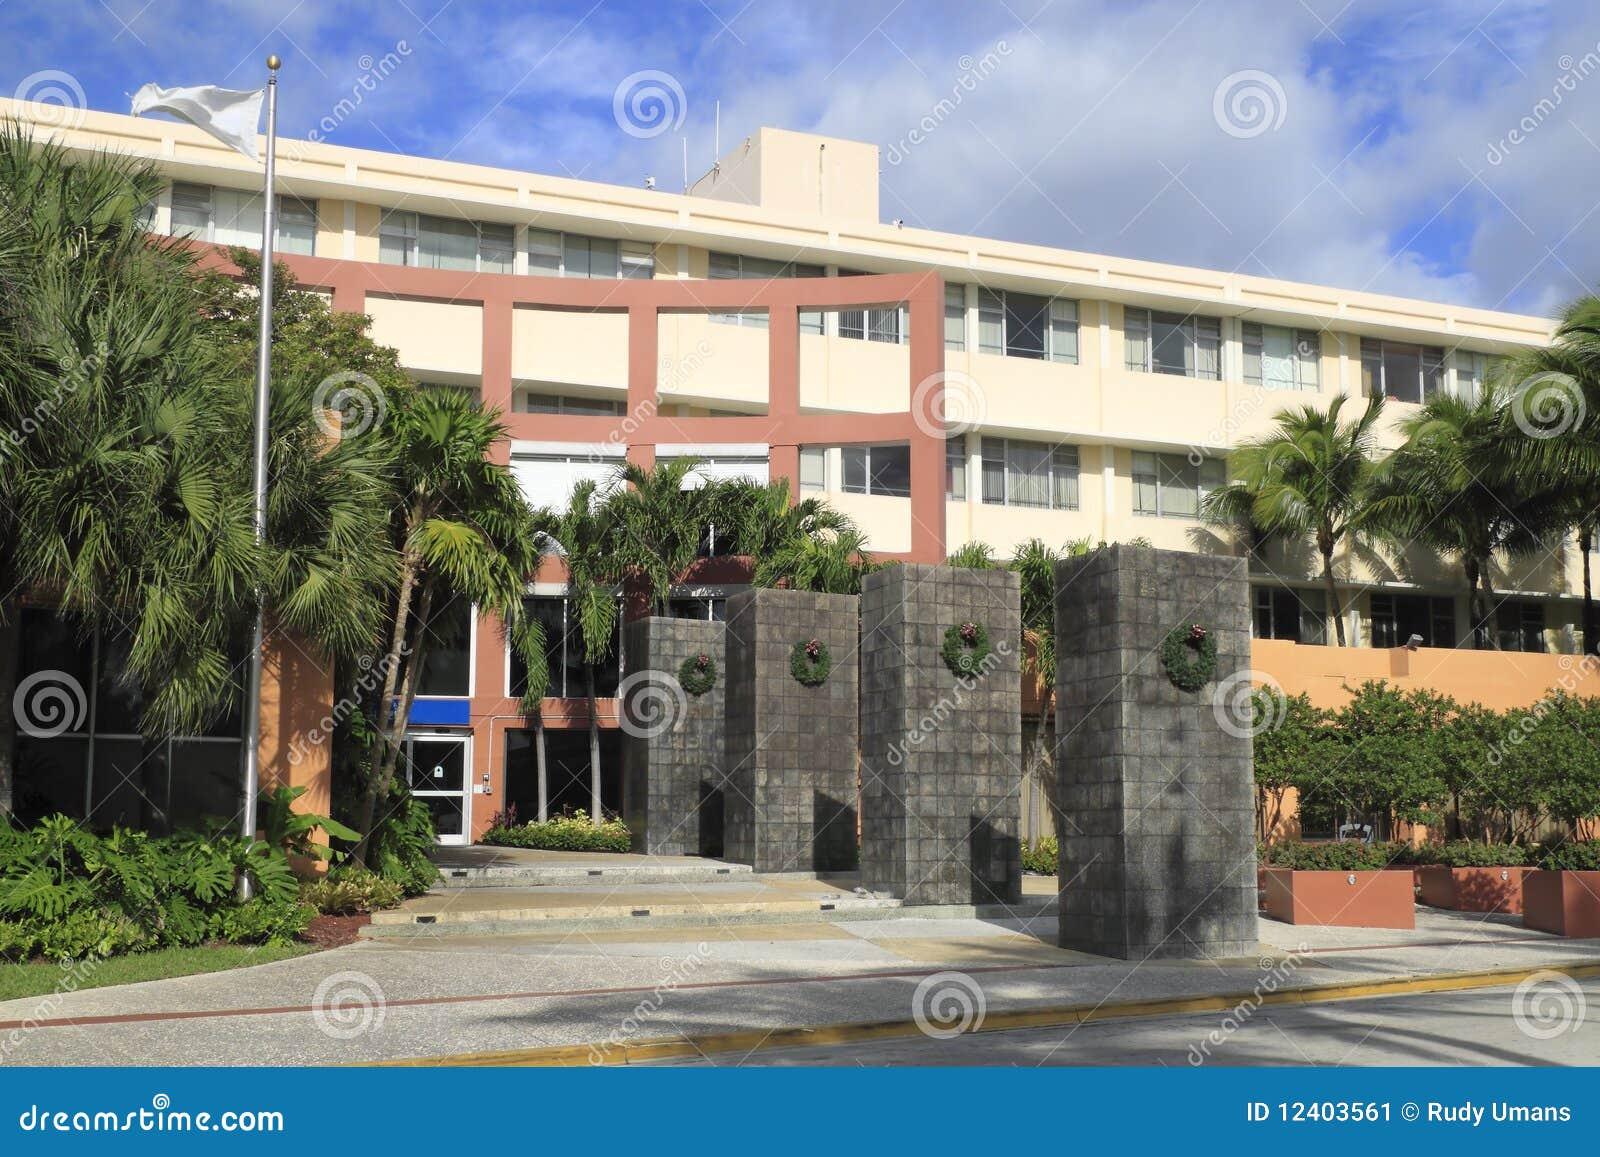 Johnson and Wales University Miami - 2